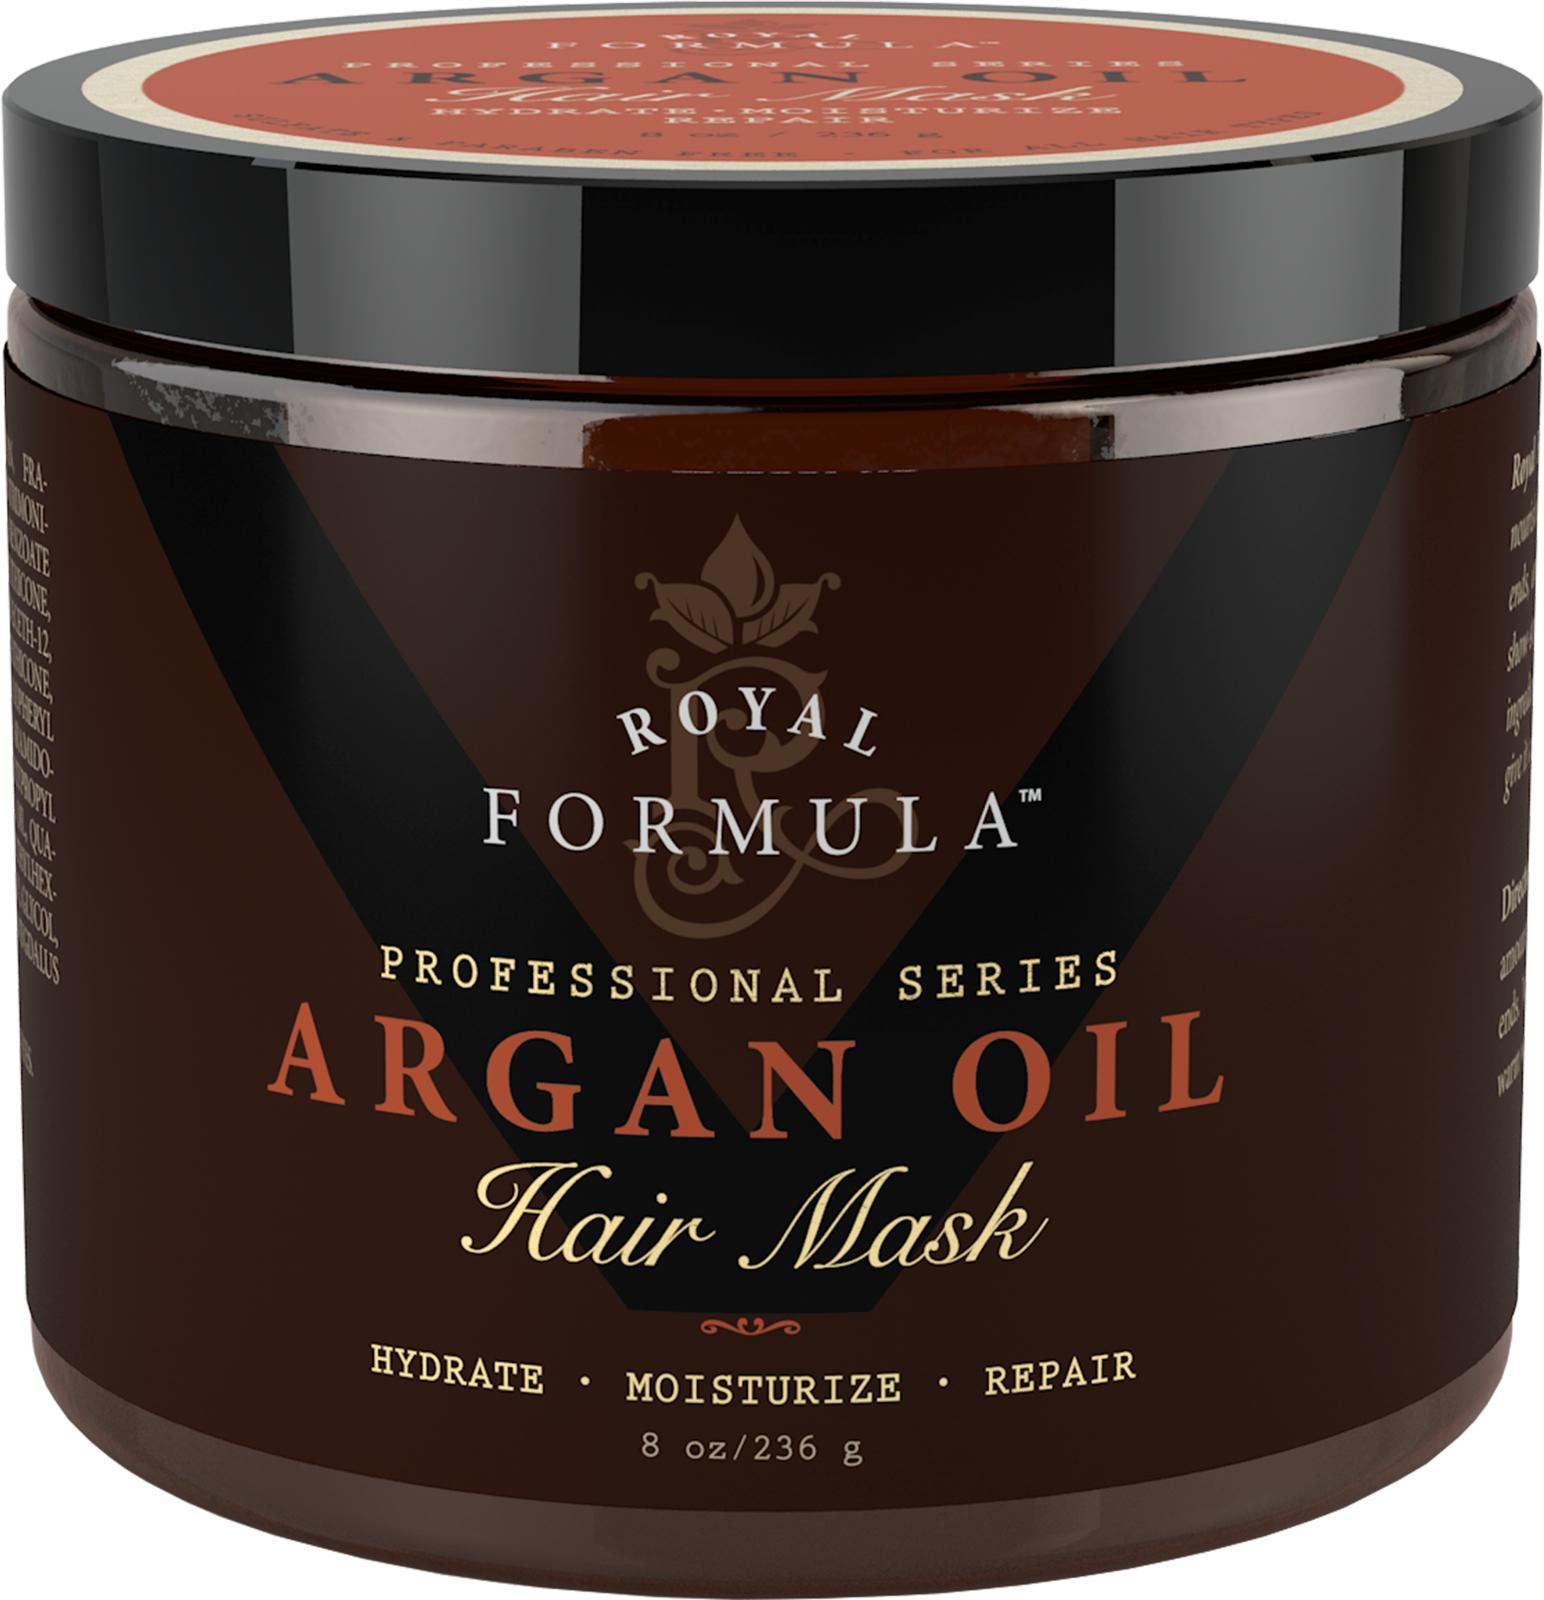 Argan Oil Hair Mask, 100% ORGANIC Argan & Almond Oils - Deep